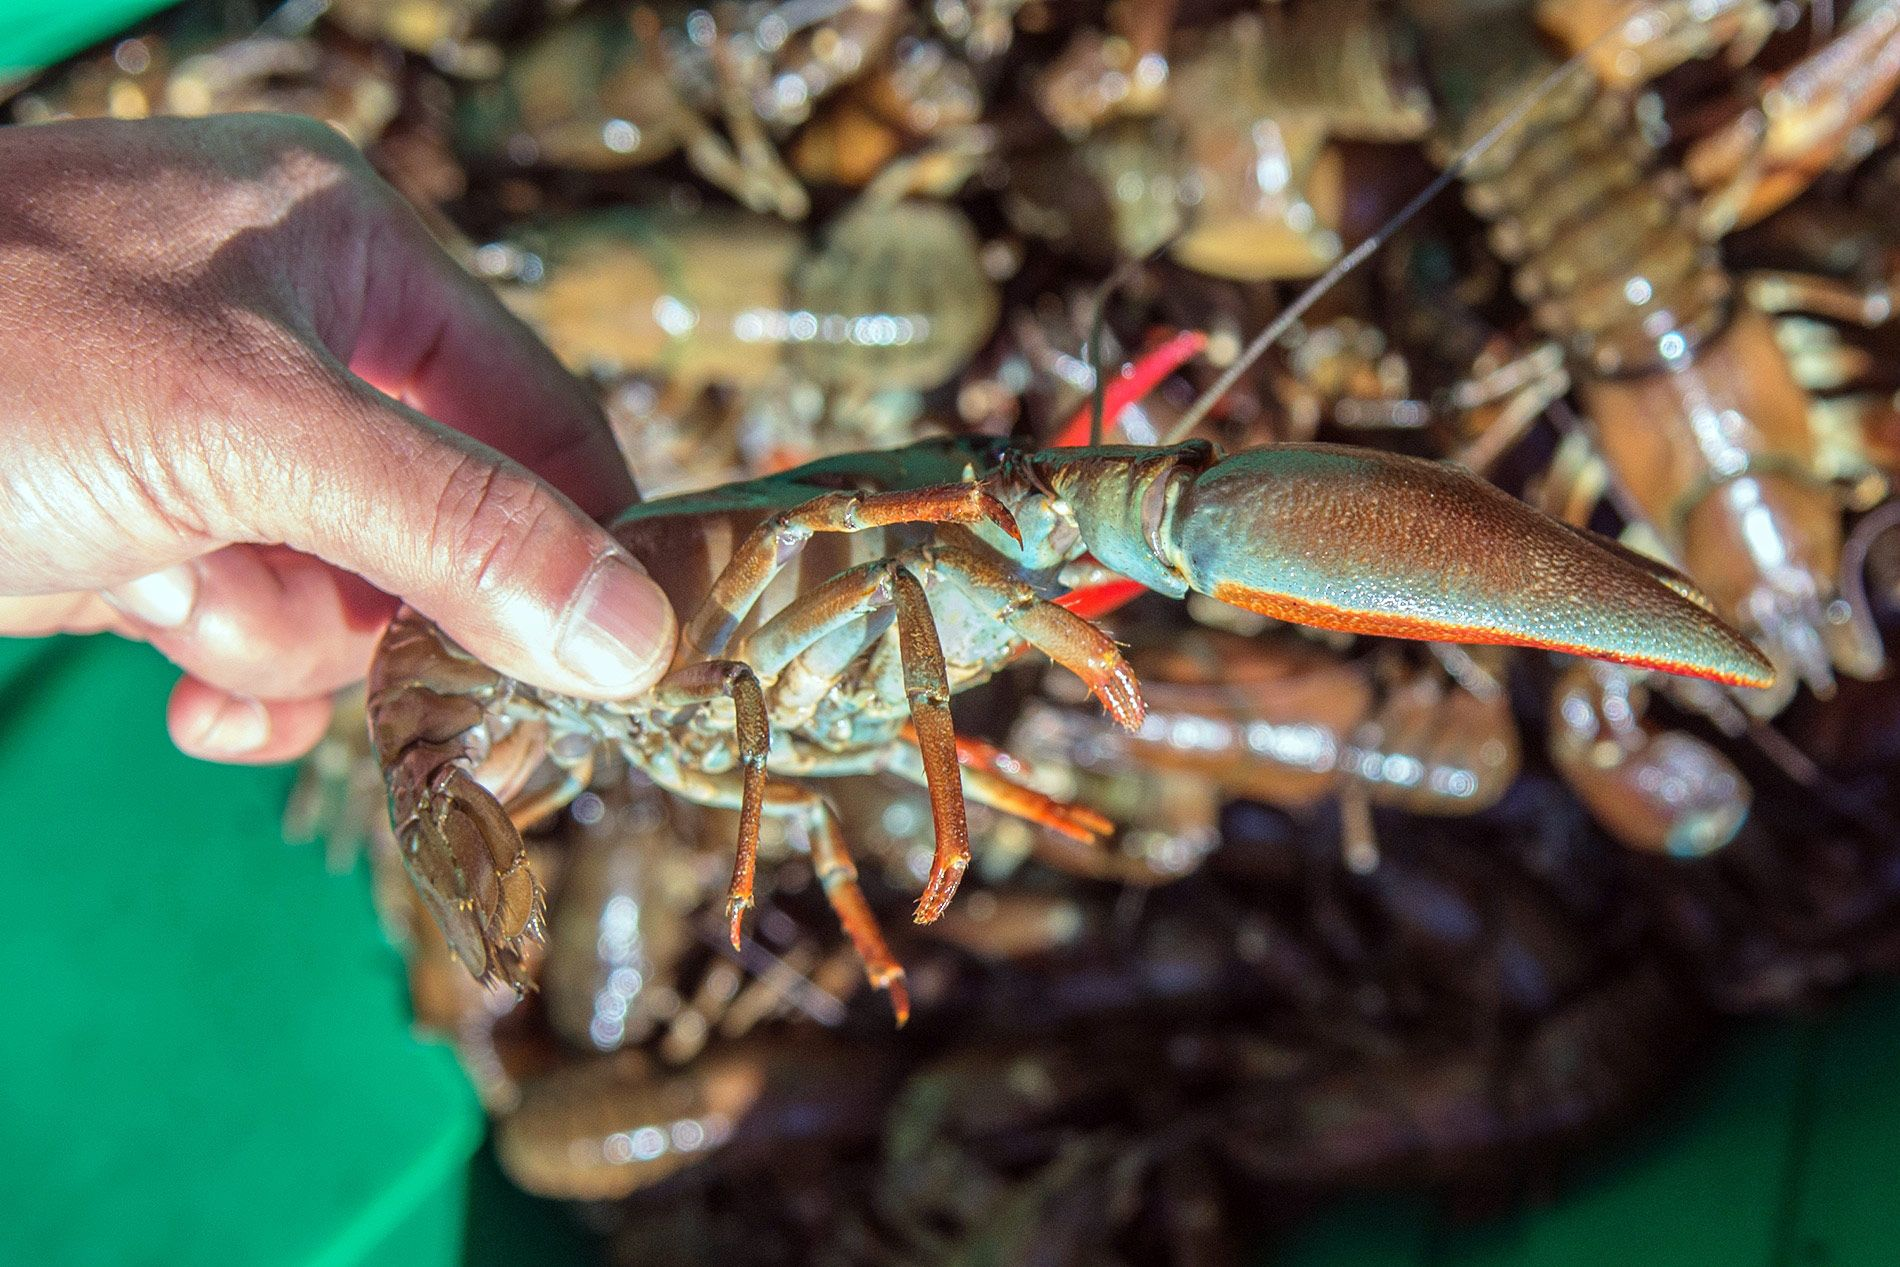 why aren't people eating washington's giant crawfish